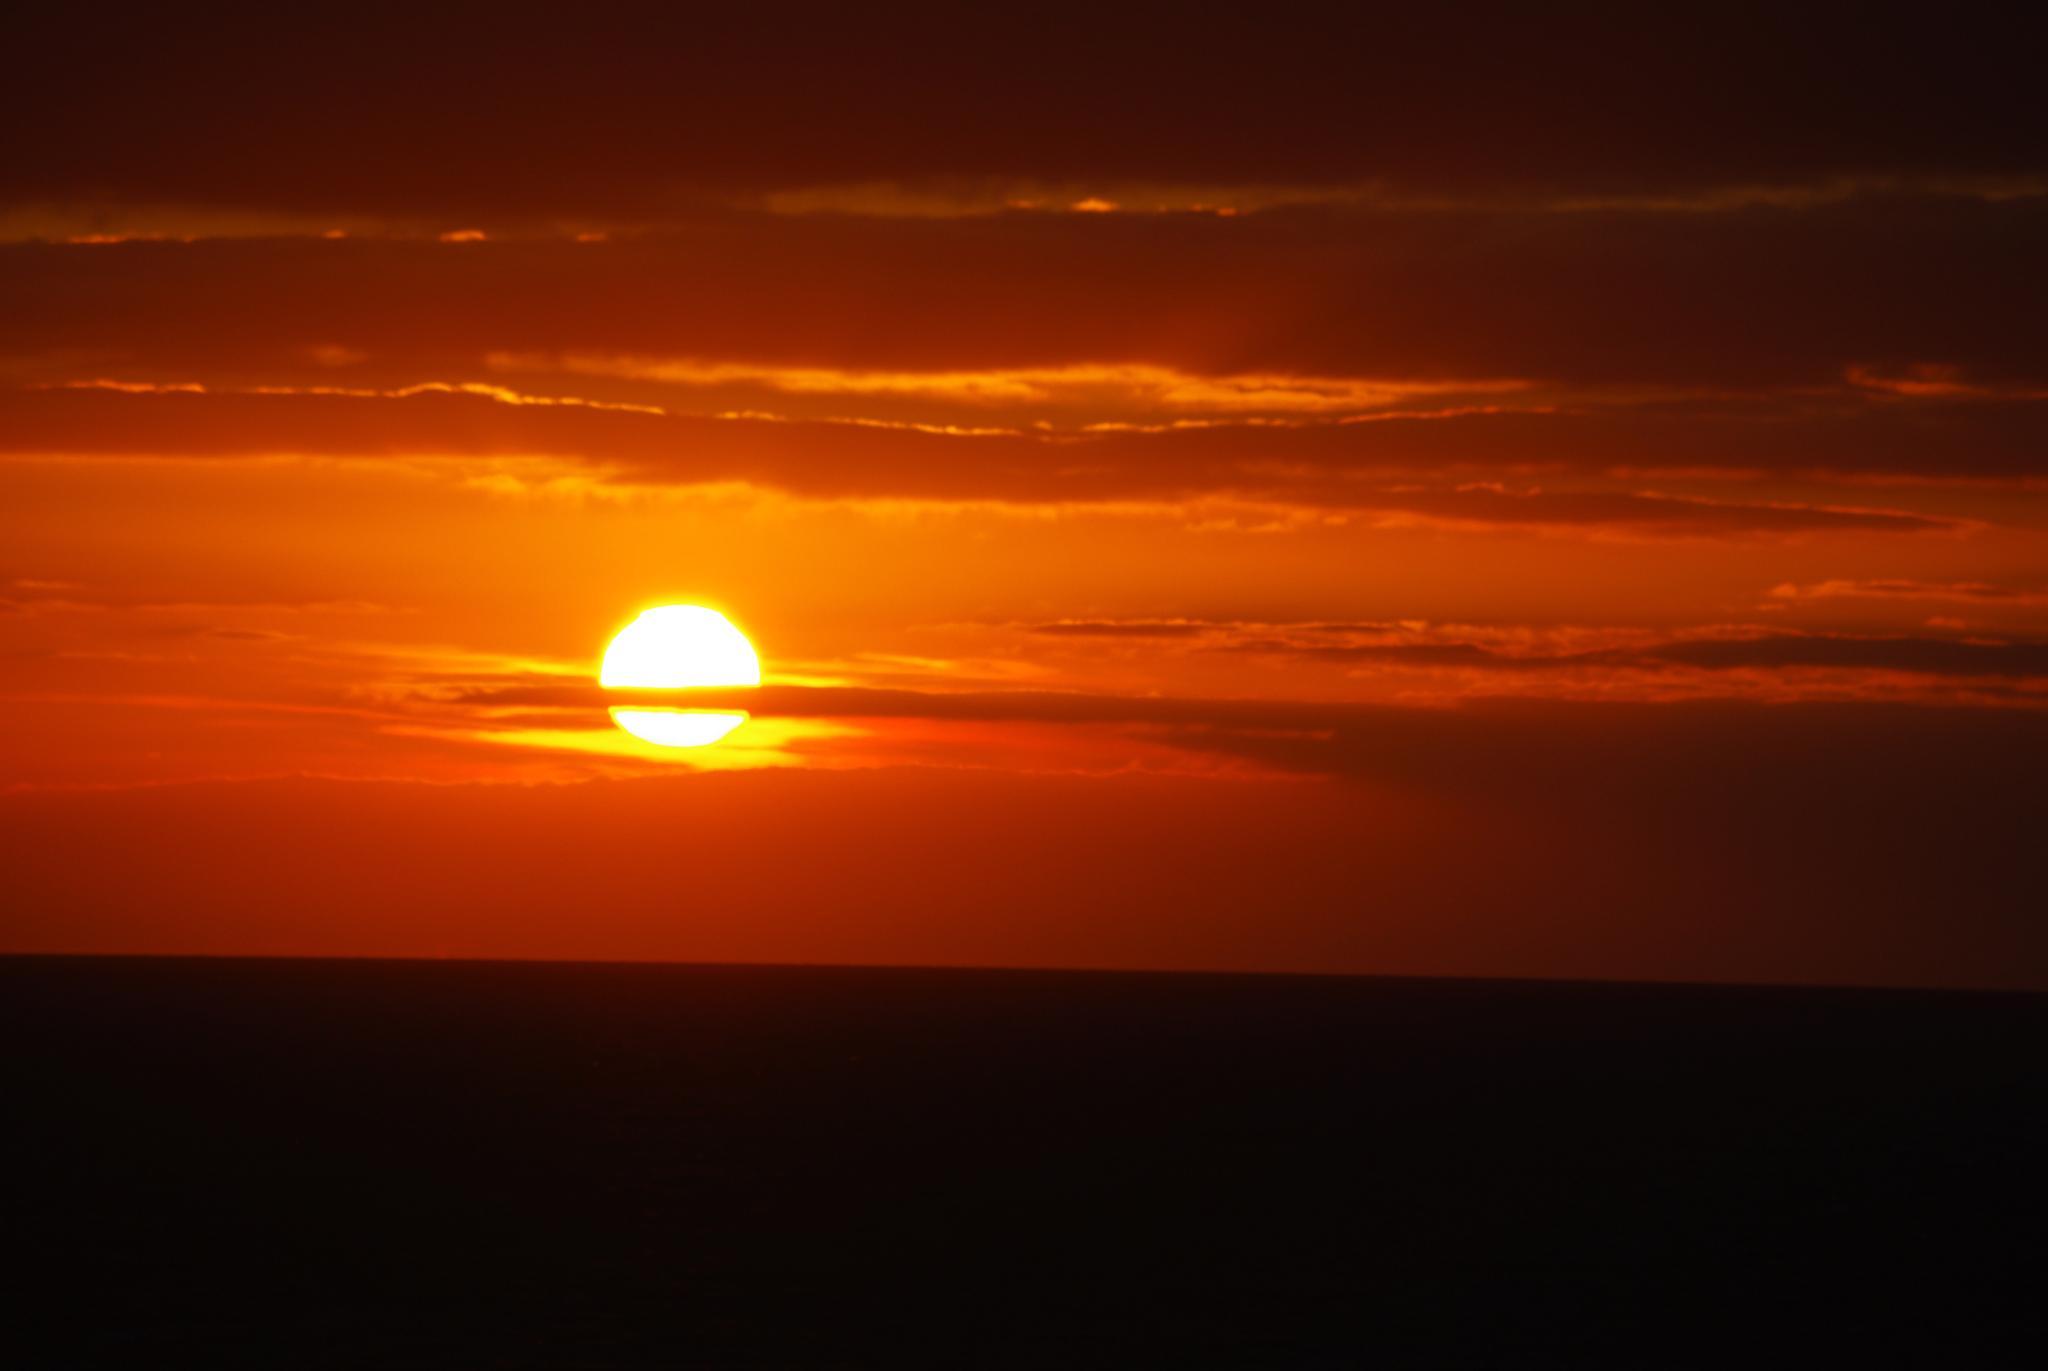 Orange Sunset by Kelly-Ann Davies